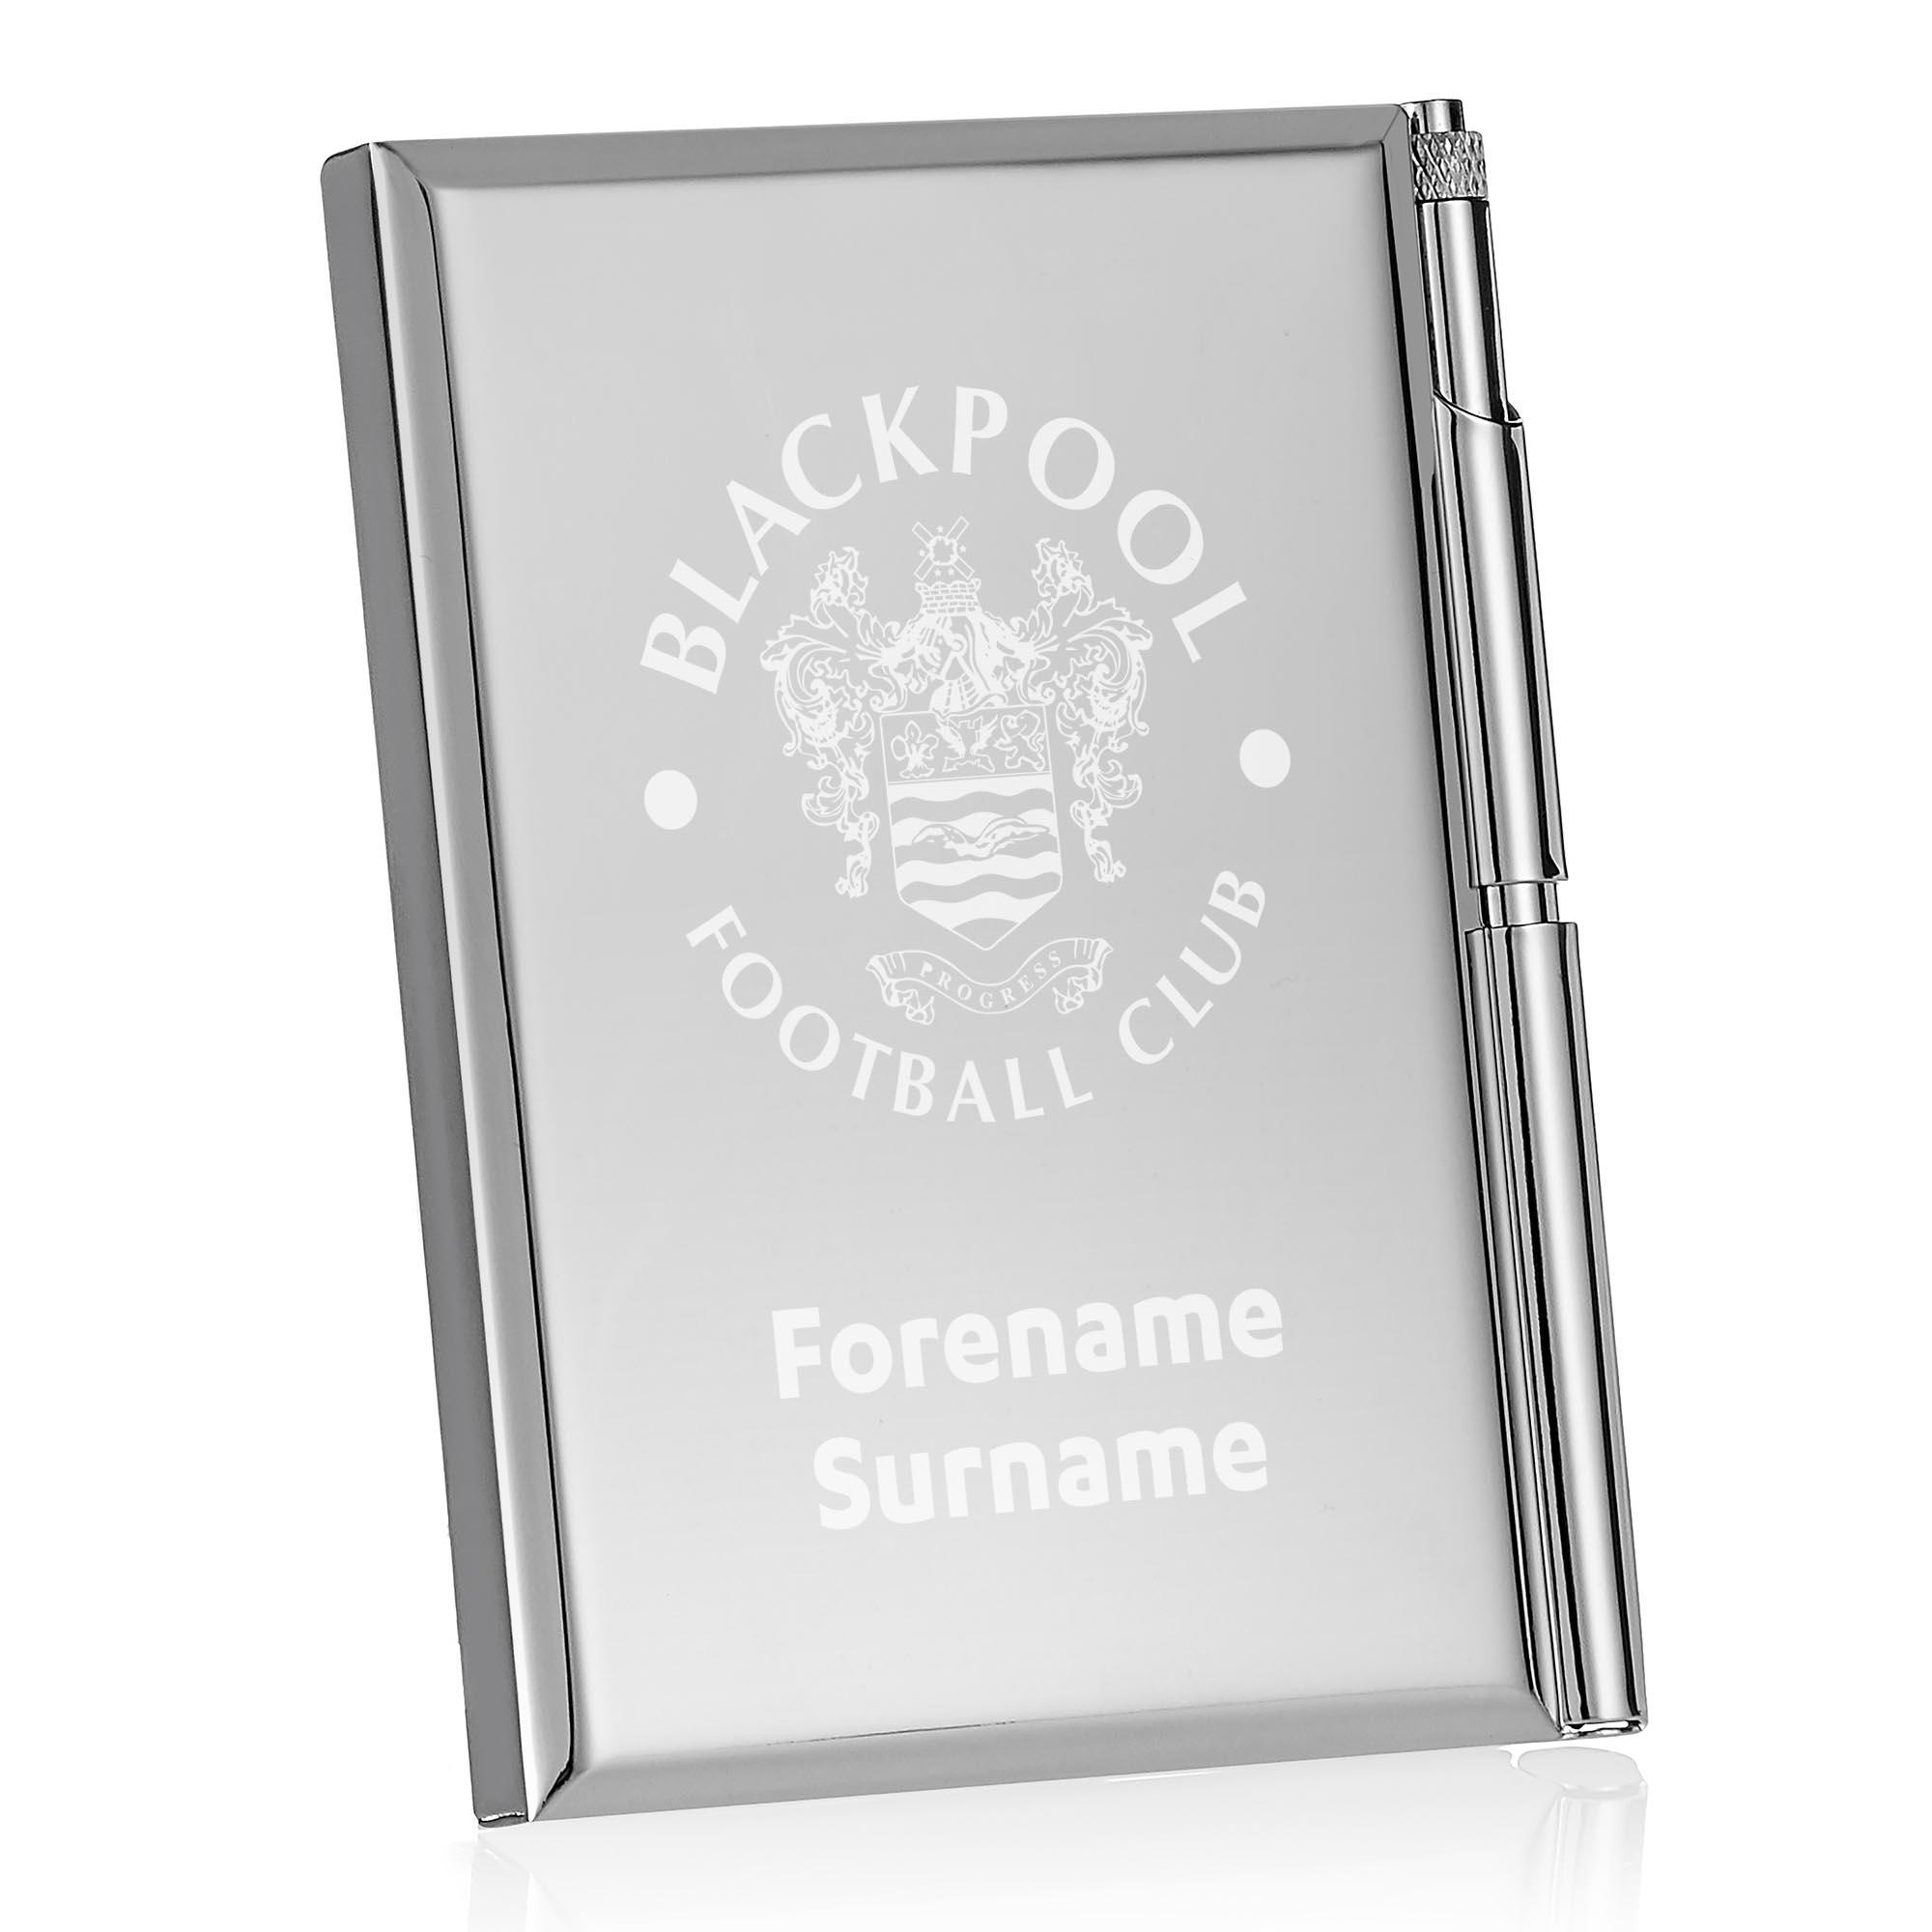 Blackpool FC Crest Address Book